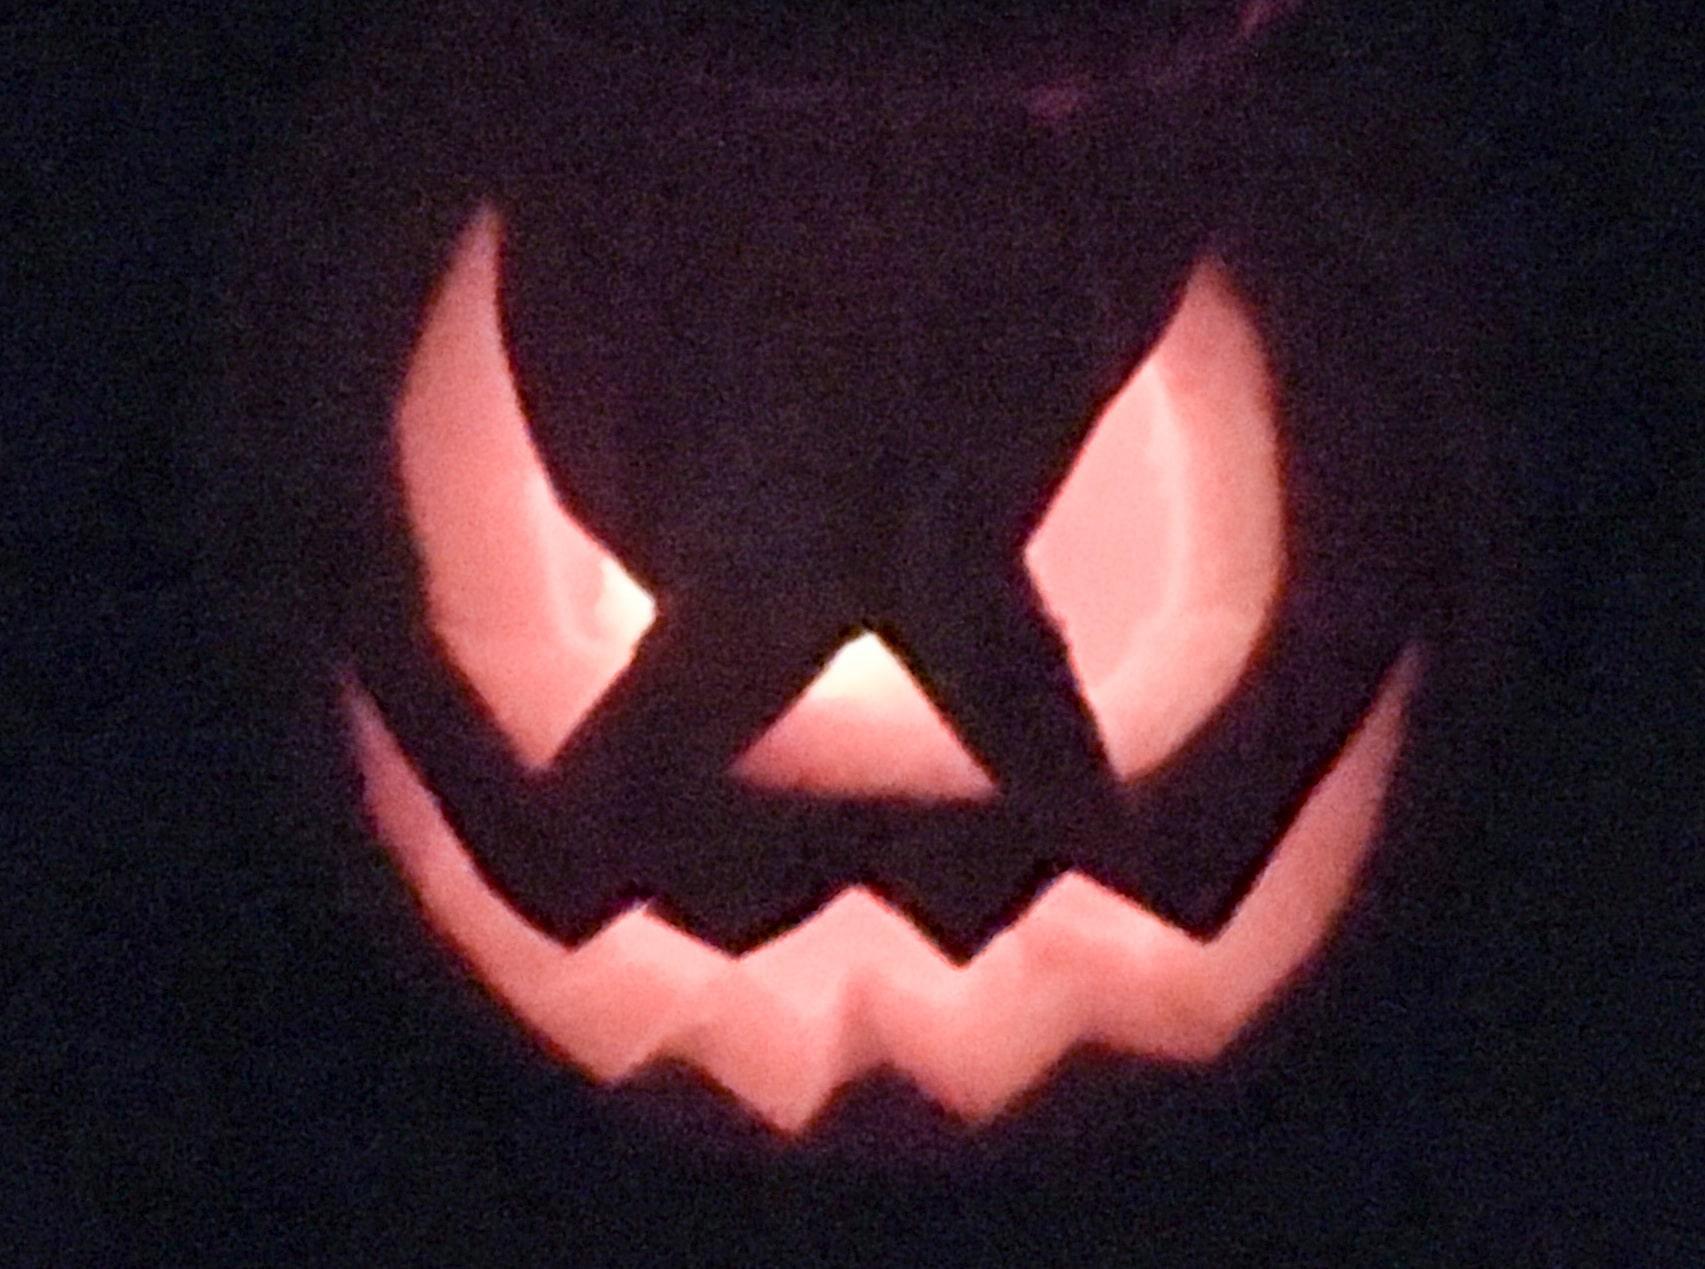 Halloween Kürbis Gesicht gruslig